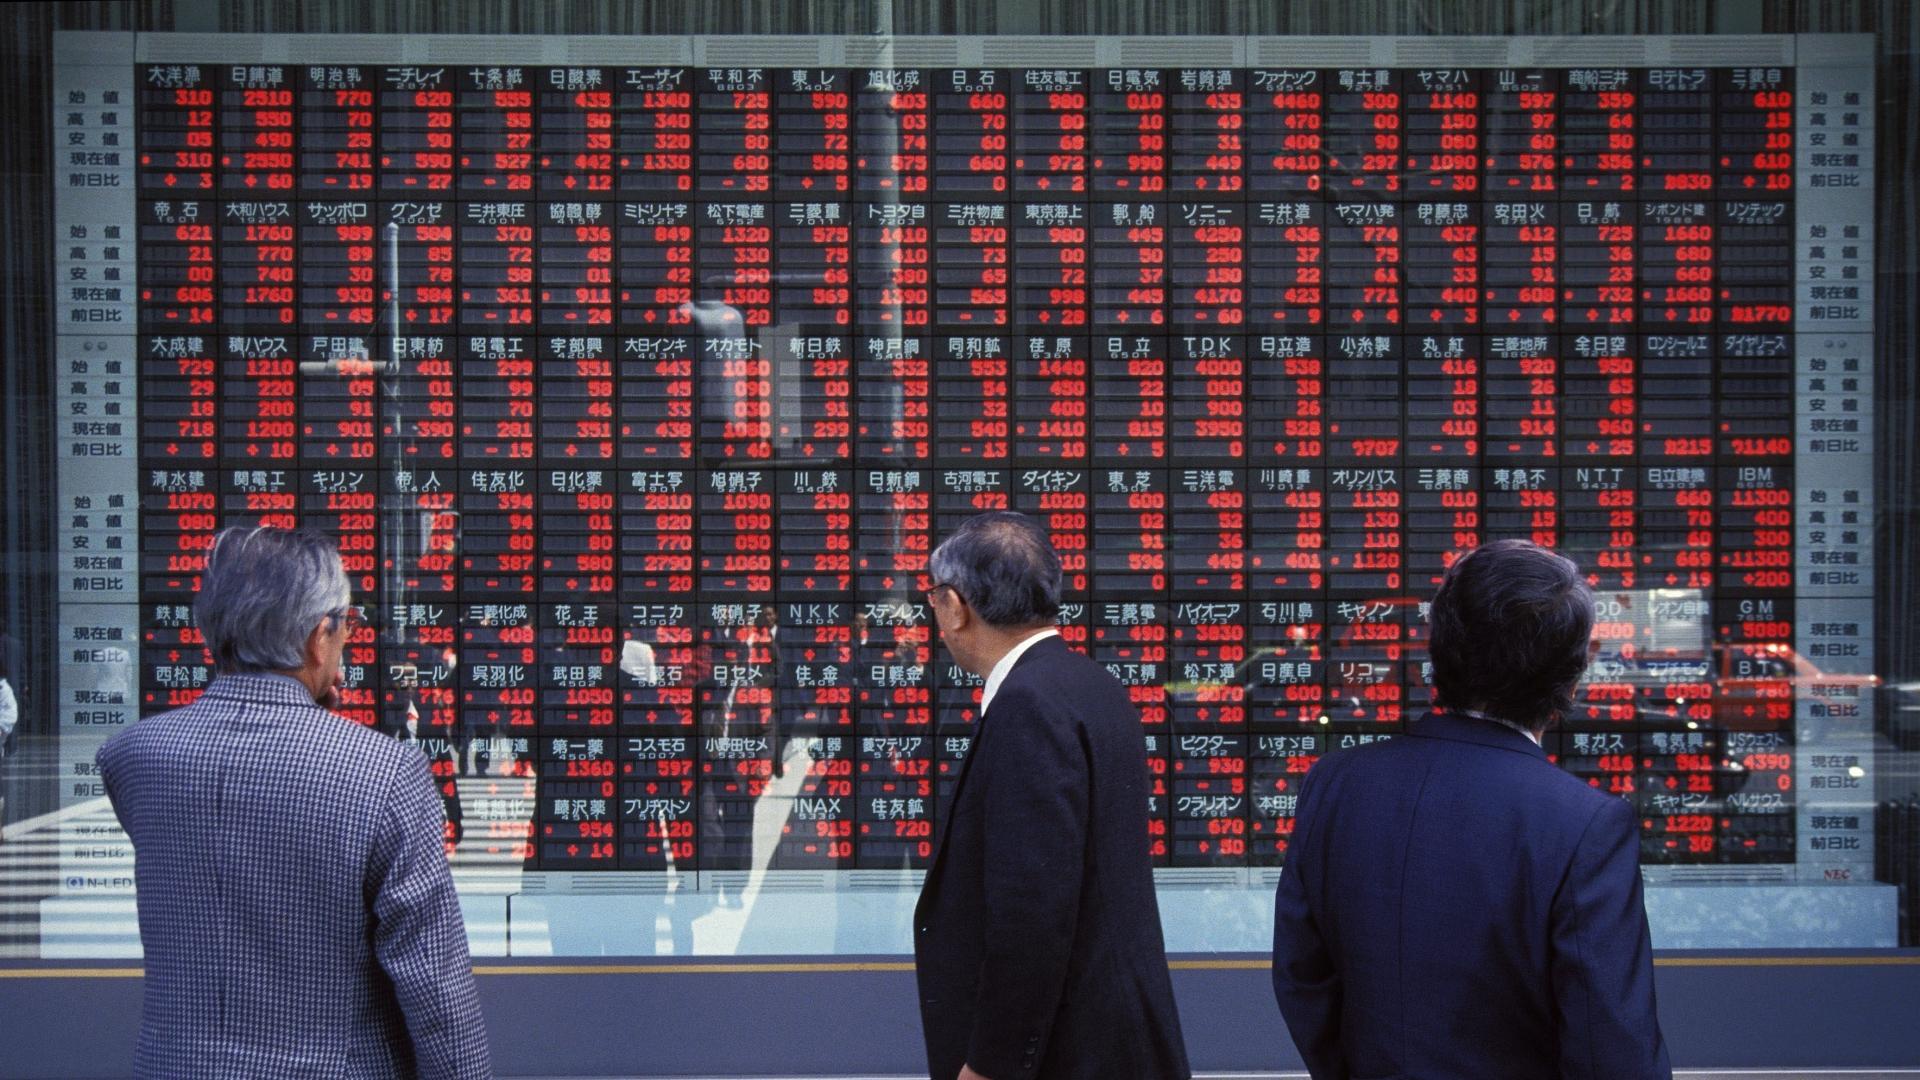 Stock Market Of Tokyo, 1992. (Credit: Kurita KAKU/Gamma-Rapho via Getty Images)